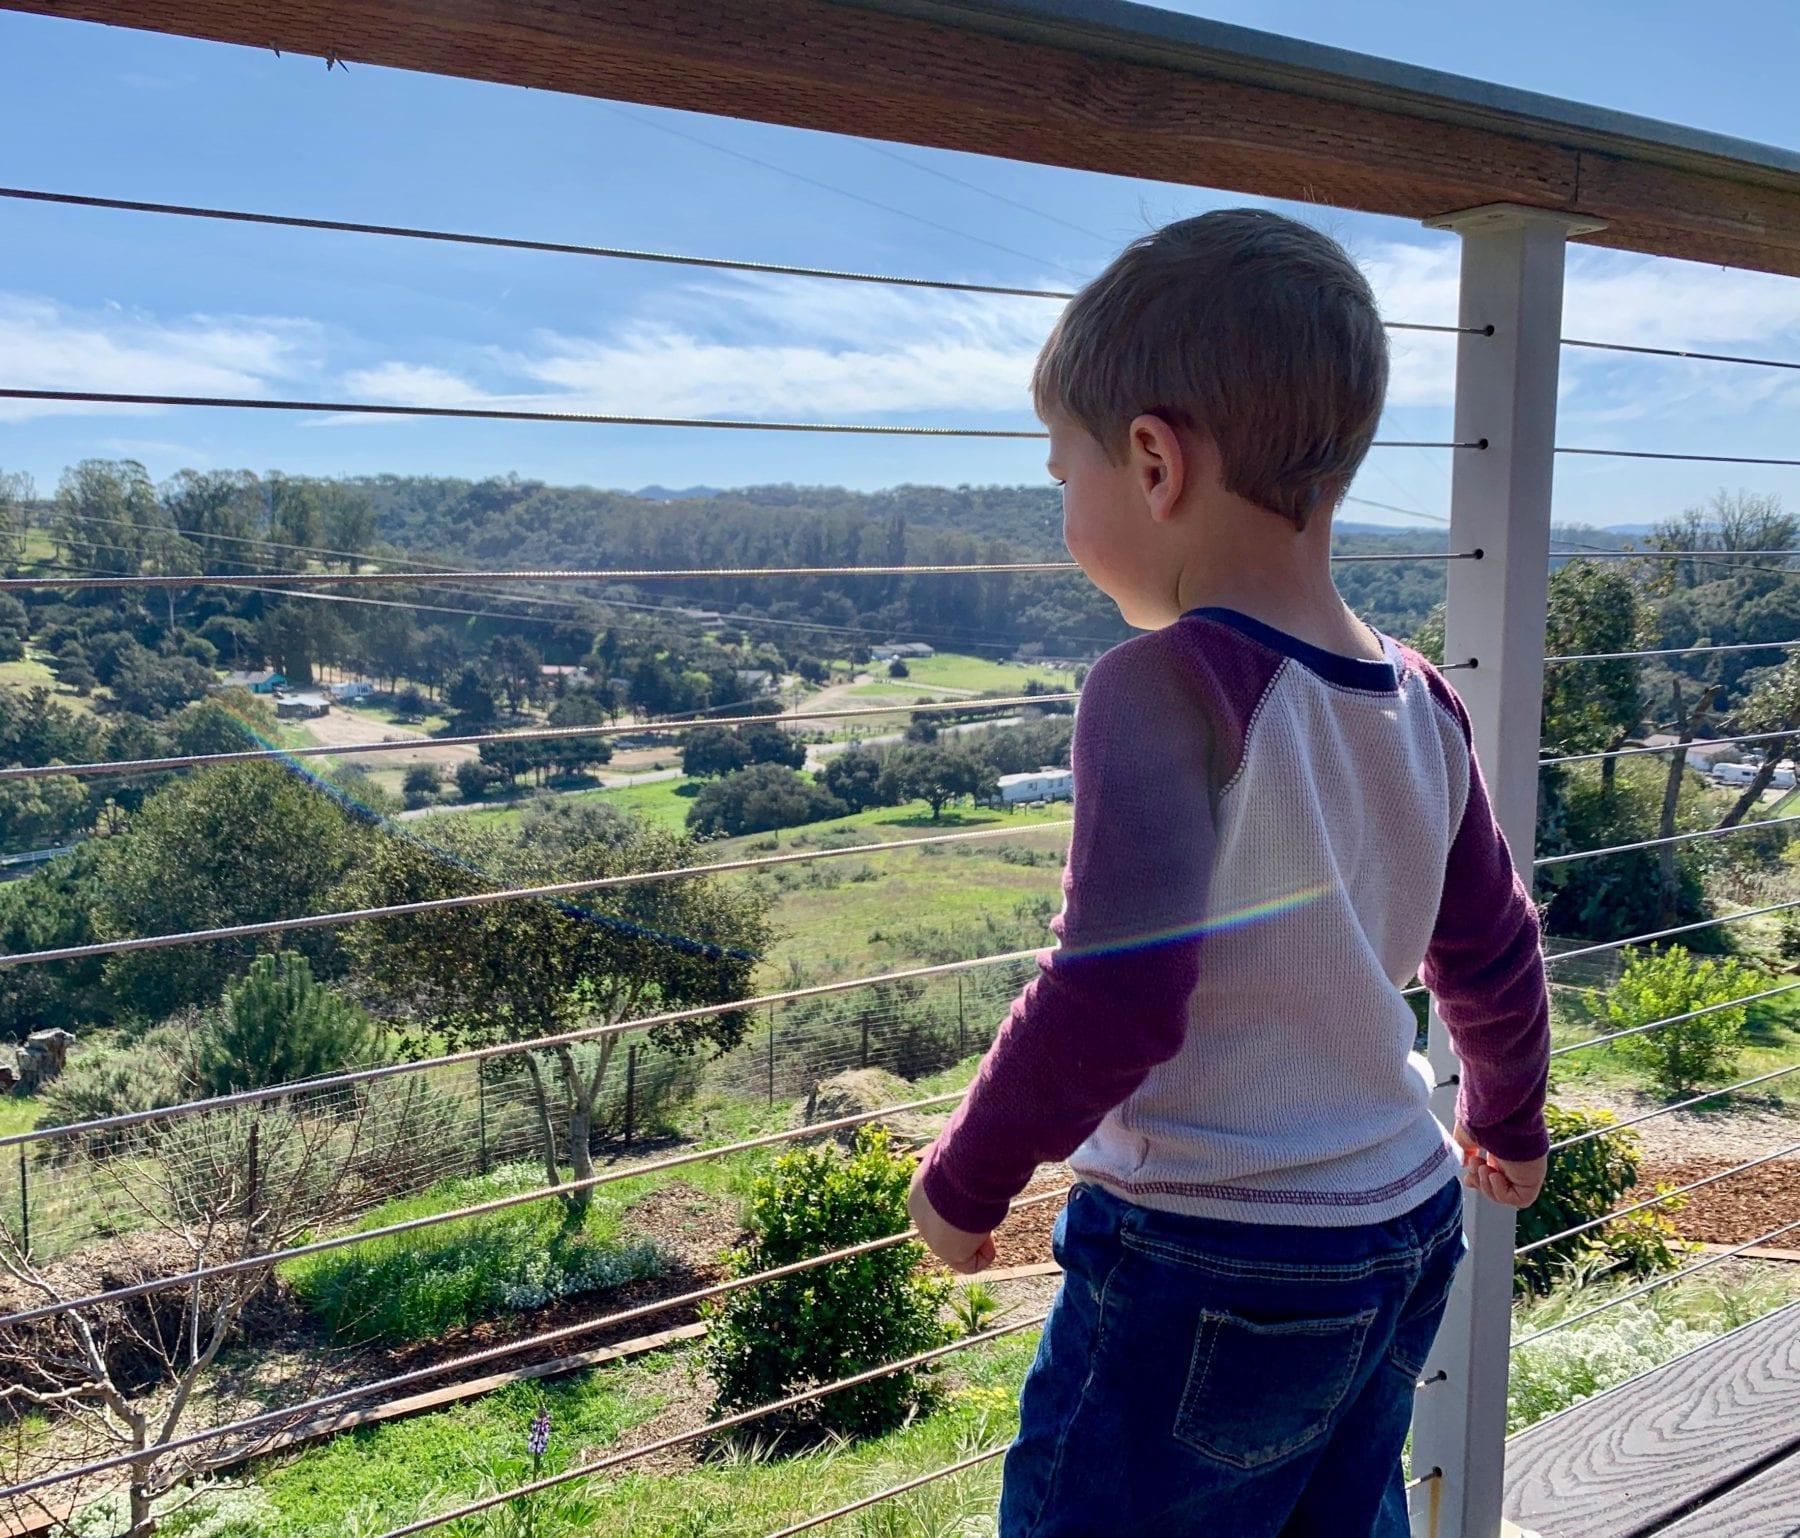 Toddler Resistant Railings - San Diego Cable Railings